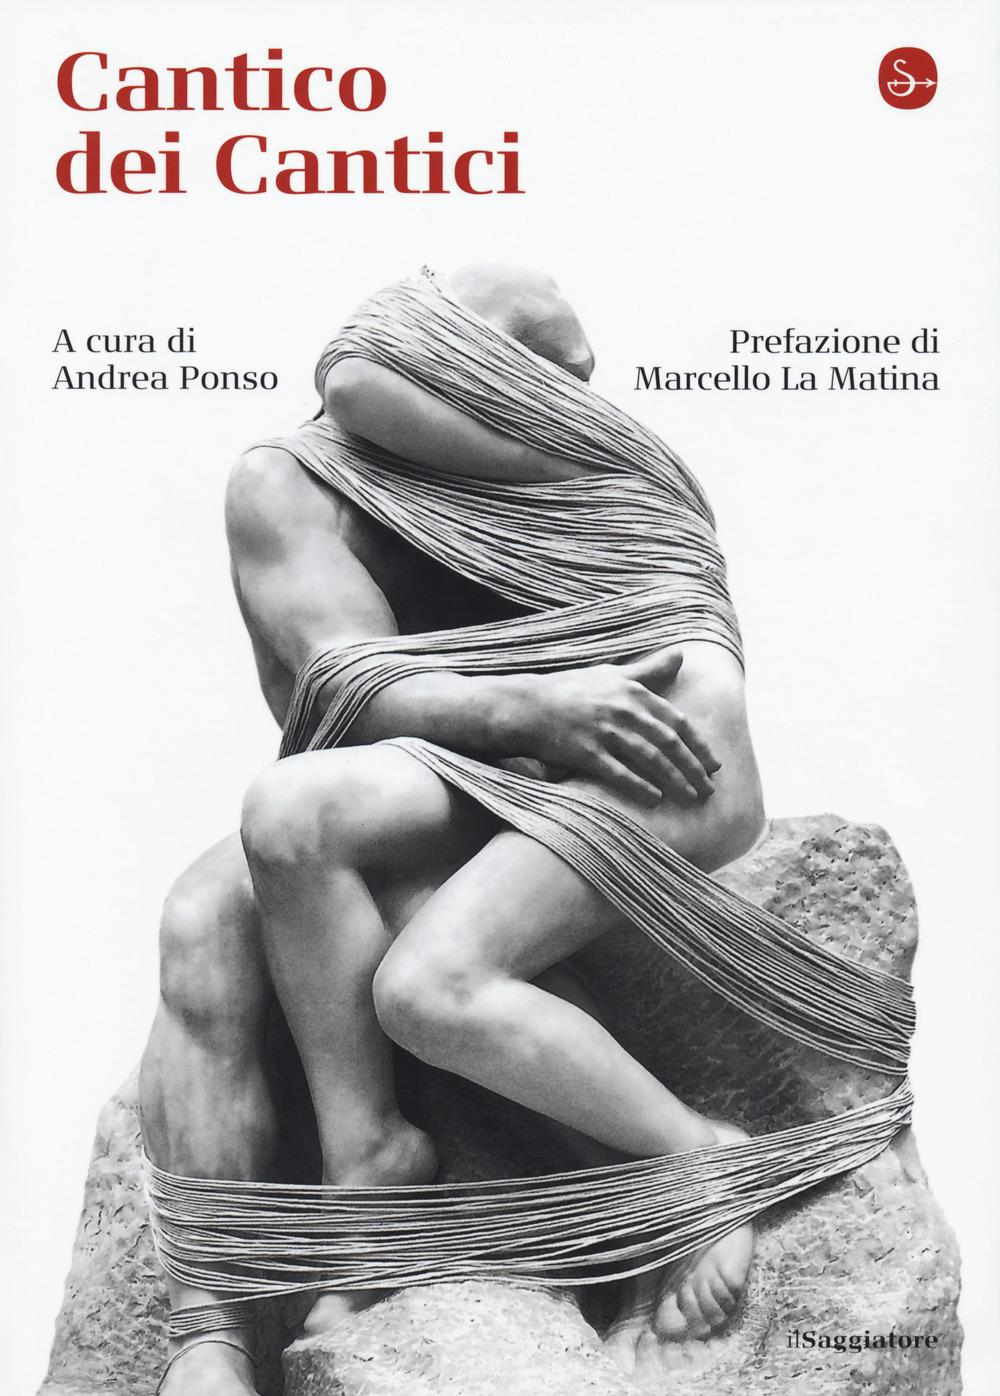 Andrea Ponso